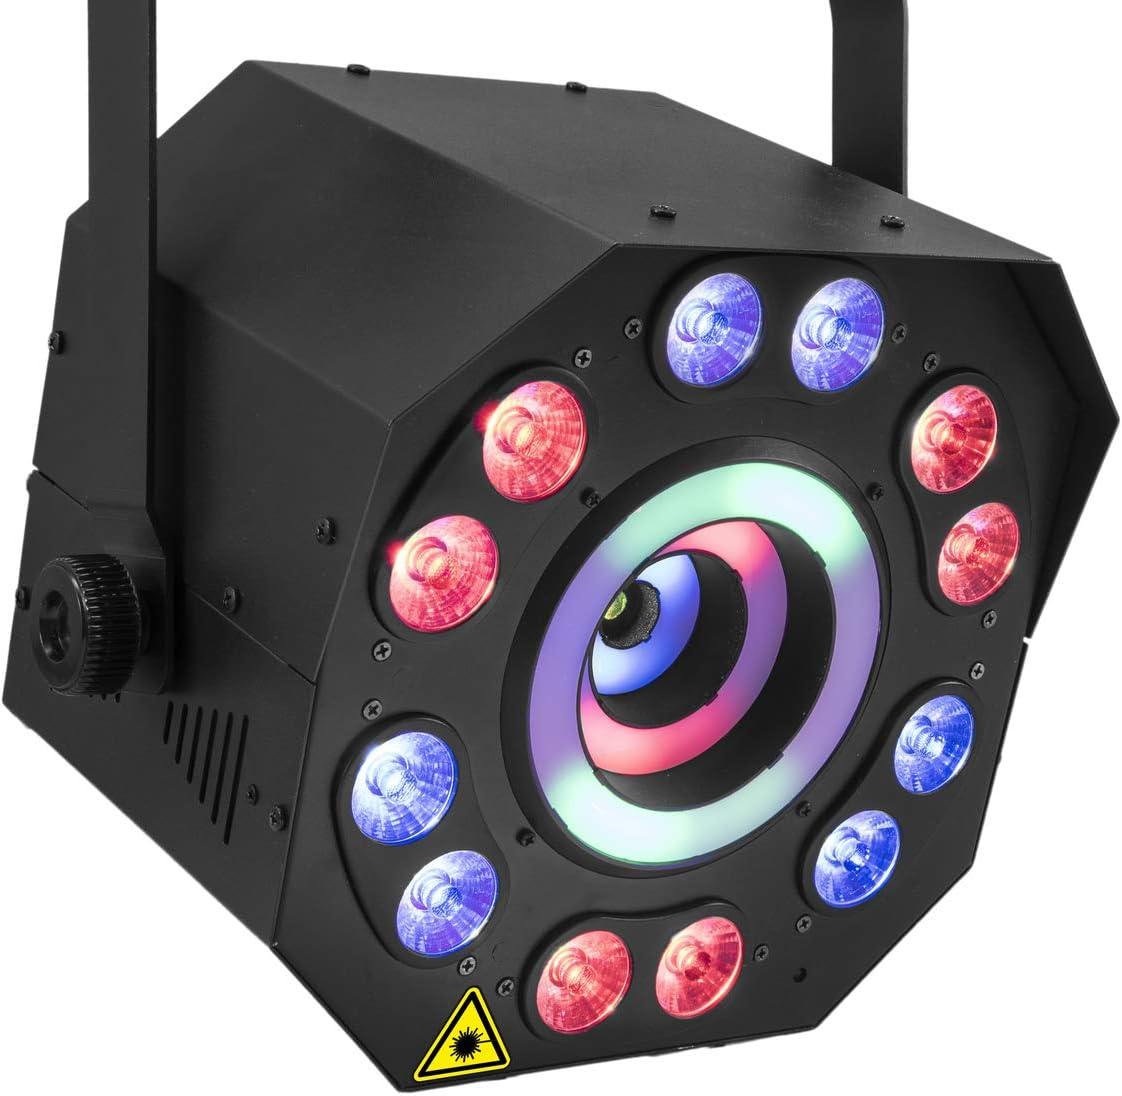 EUROLITE LED FE-2500 Hypno Hybrid Laser Effect